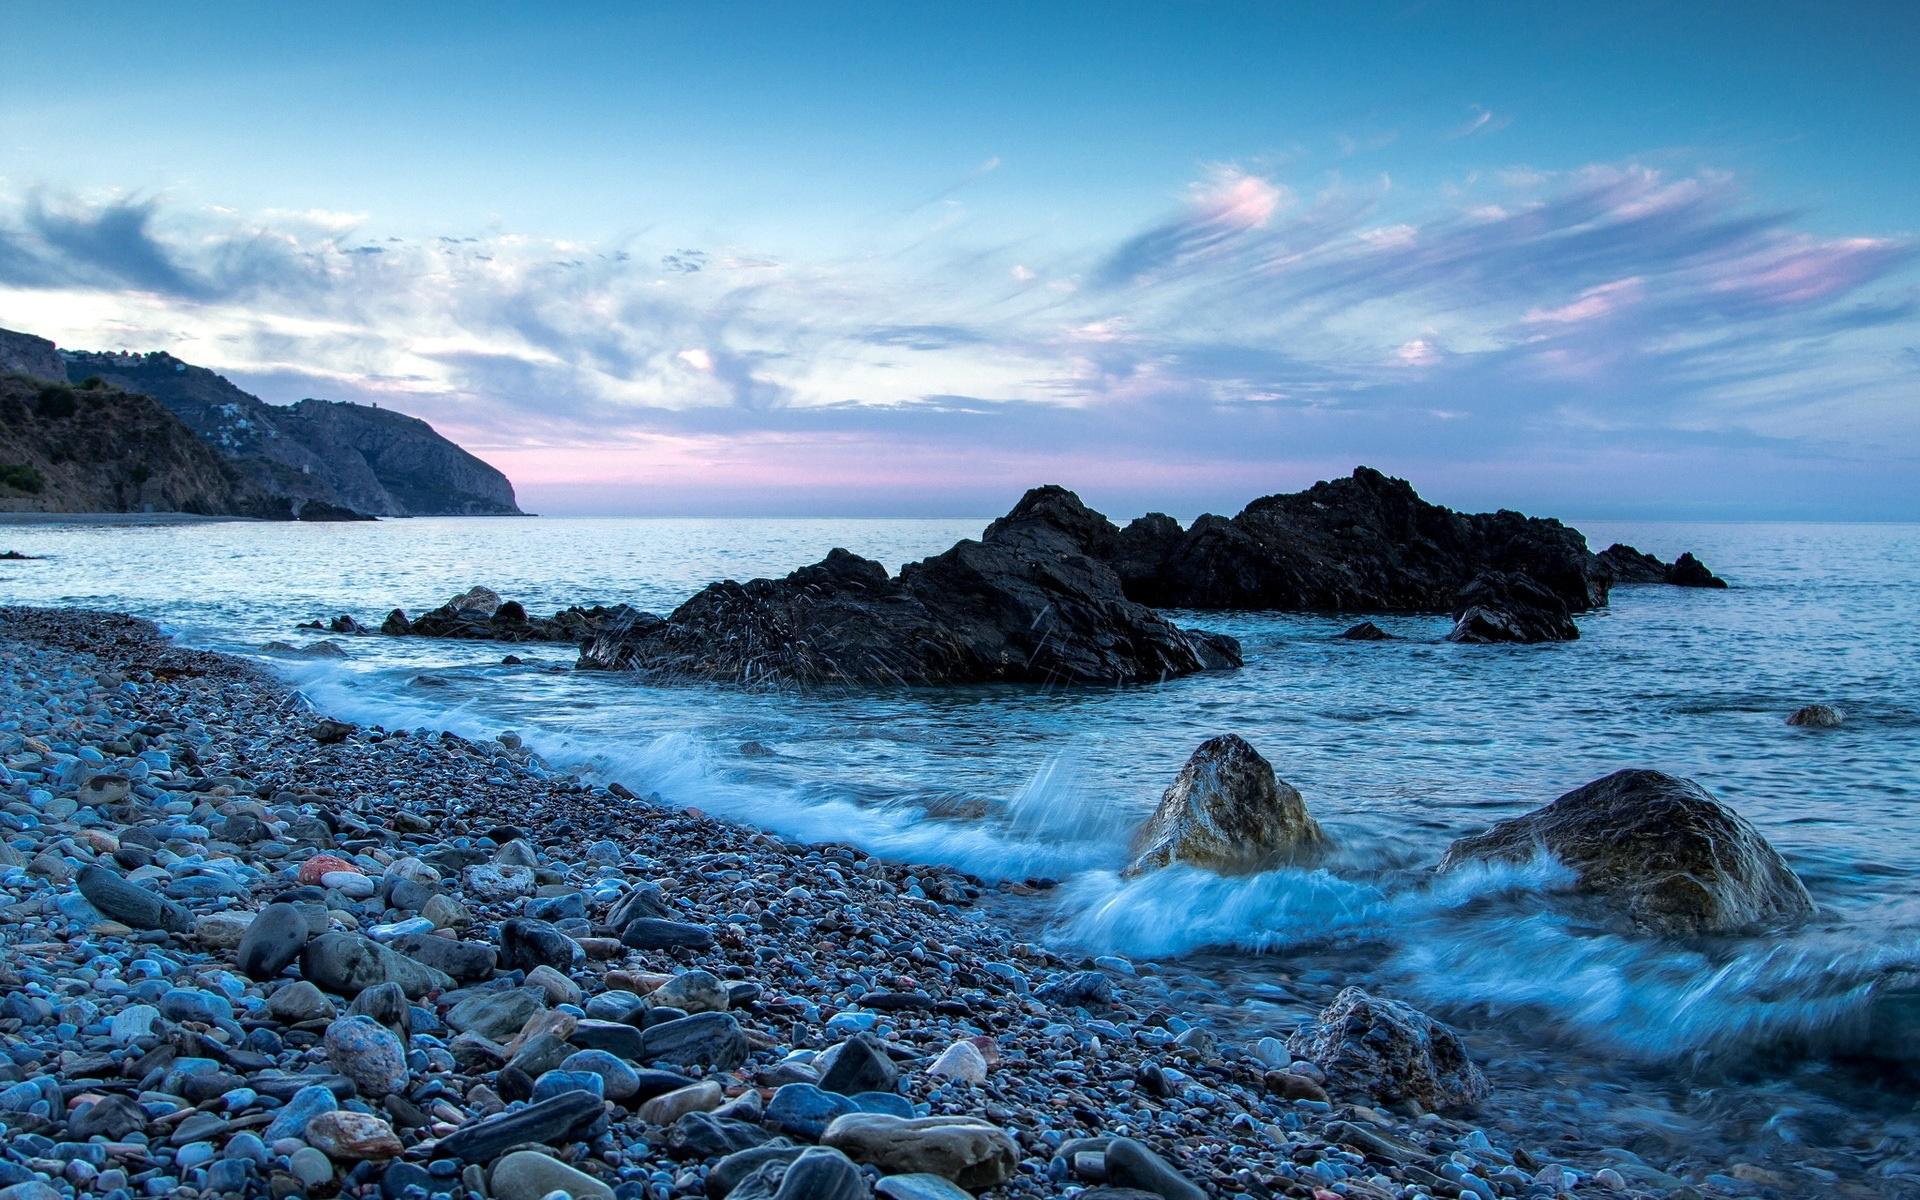 Wallpaper Sea Beach Rocks Waves 1920x1200 Hd Picture Image